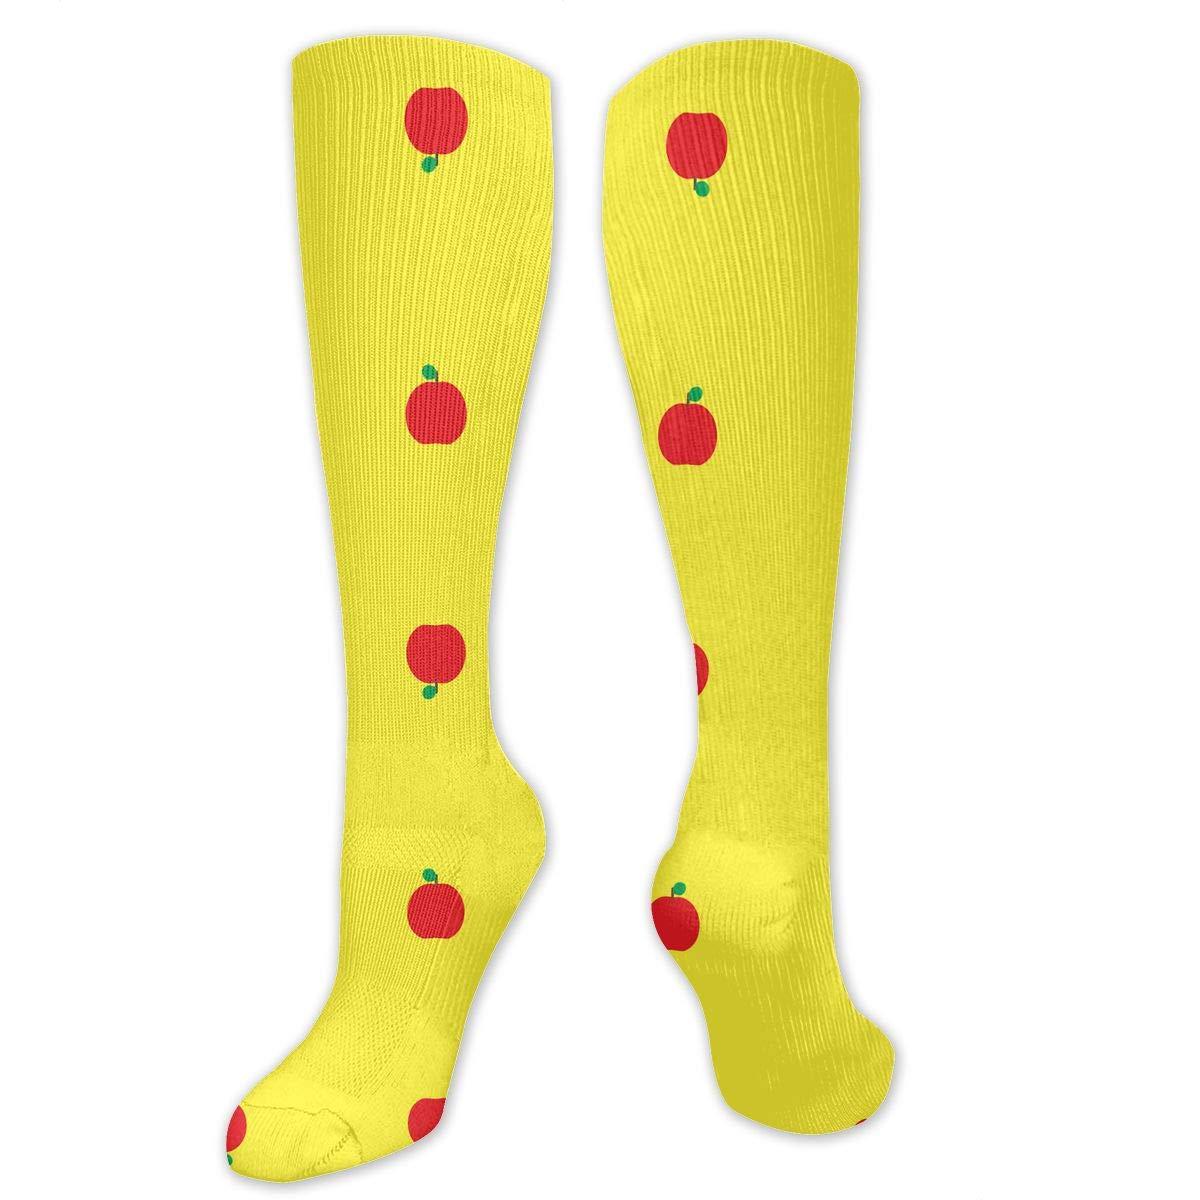 Willbegood99 Fantastic Red Apple Yellow Mens Fun Dress Socks Colorful Pattened Novelty Mid-Calf Crew Socks Premium Cotton Vibrant Art Socks